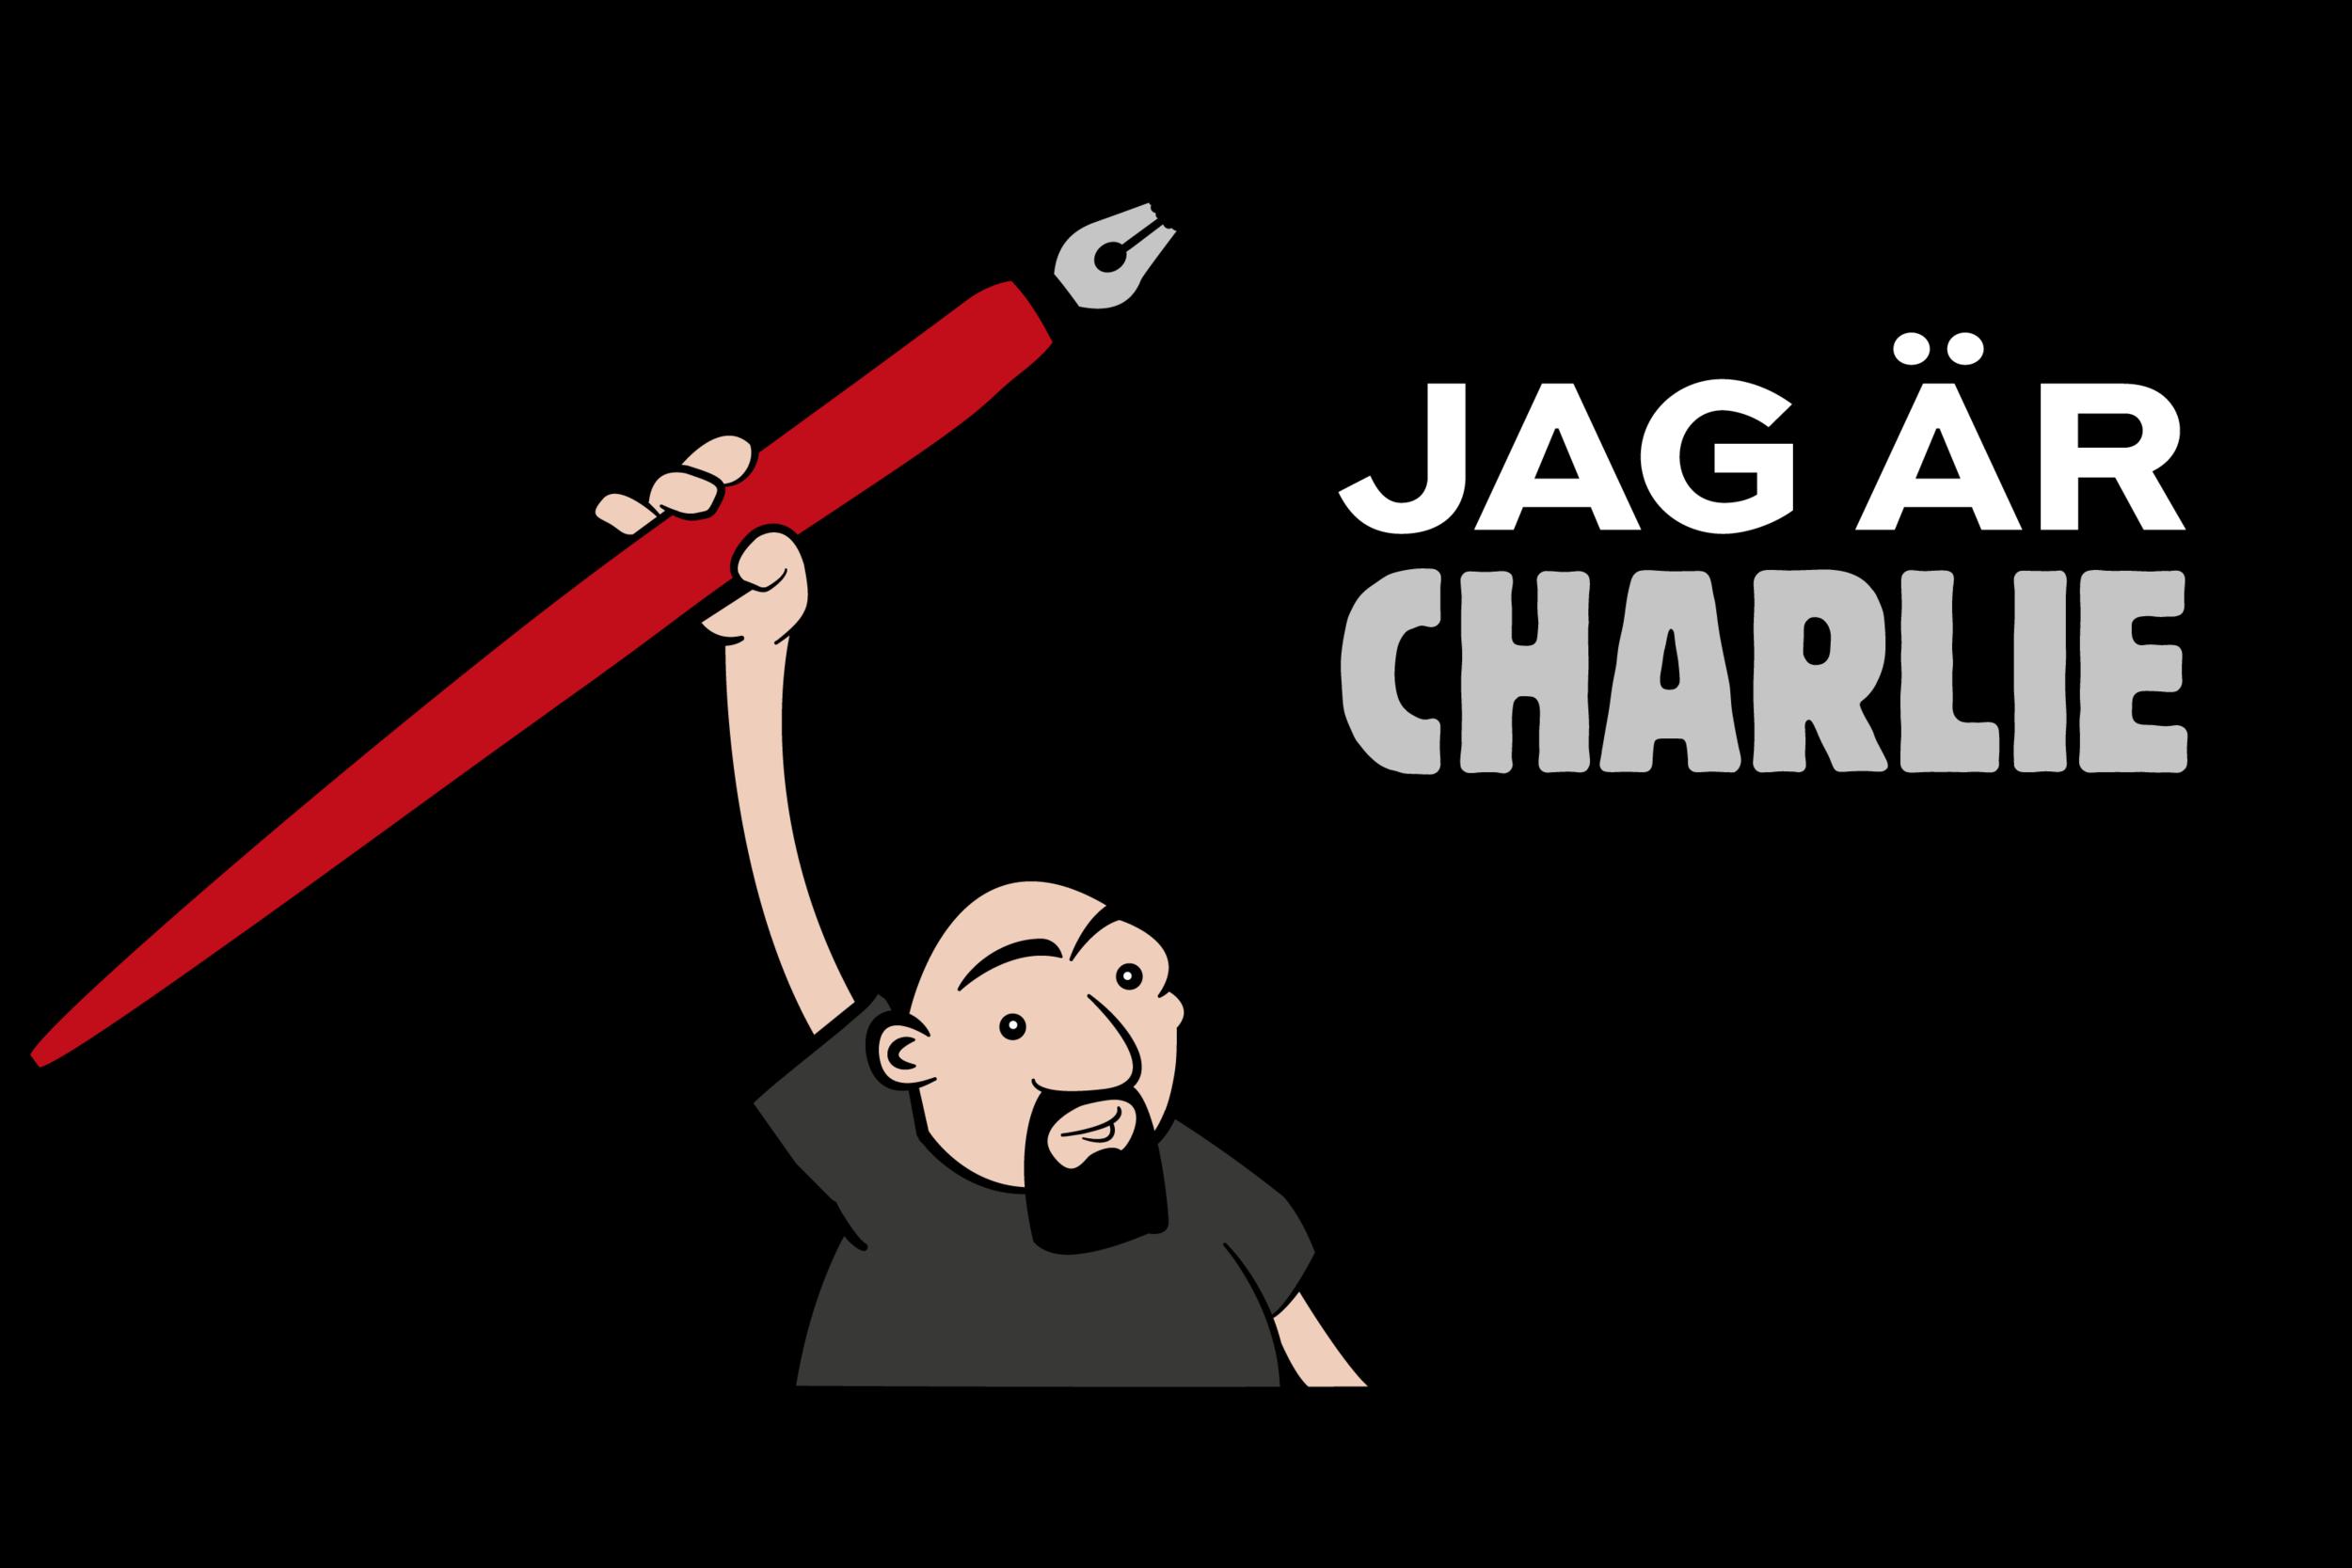 jag-ar-charlie.png